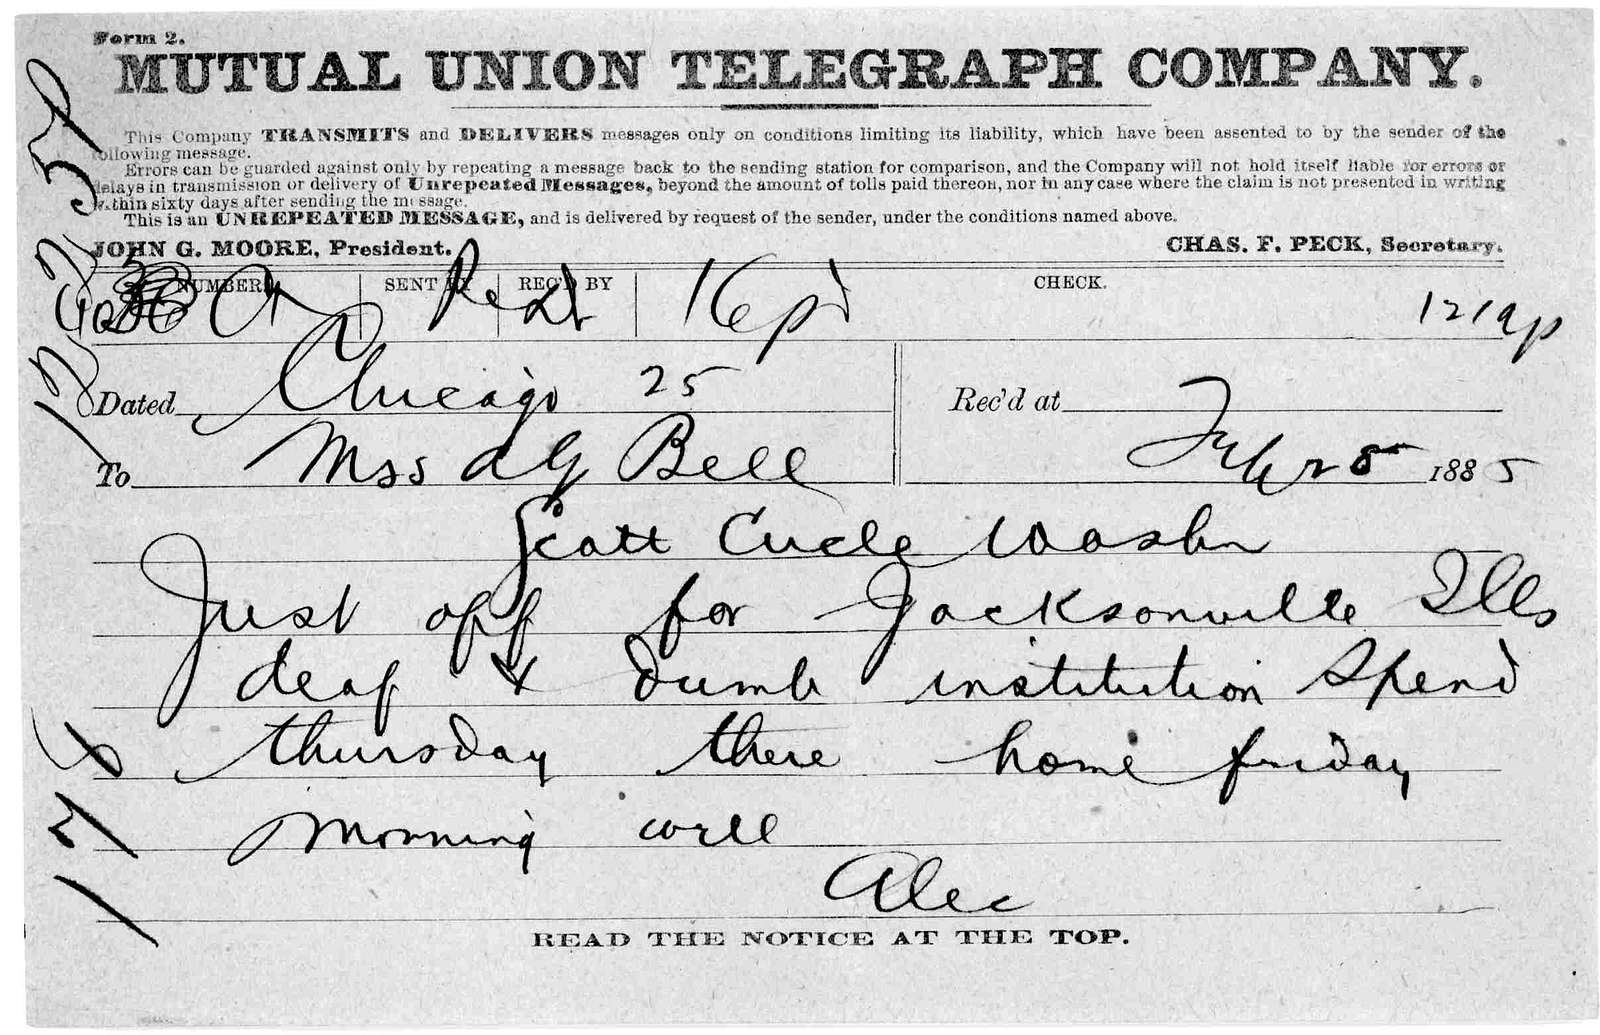 Telegram from Alexander Graham Bell to Mabel Hubbard Bell, February 28, 1885